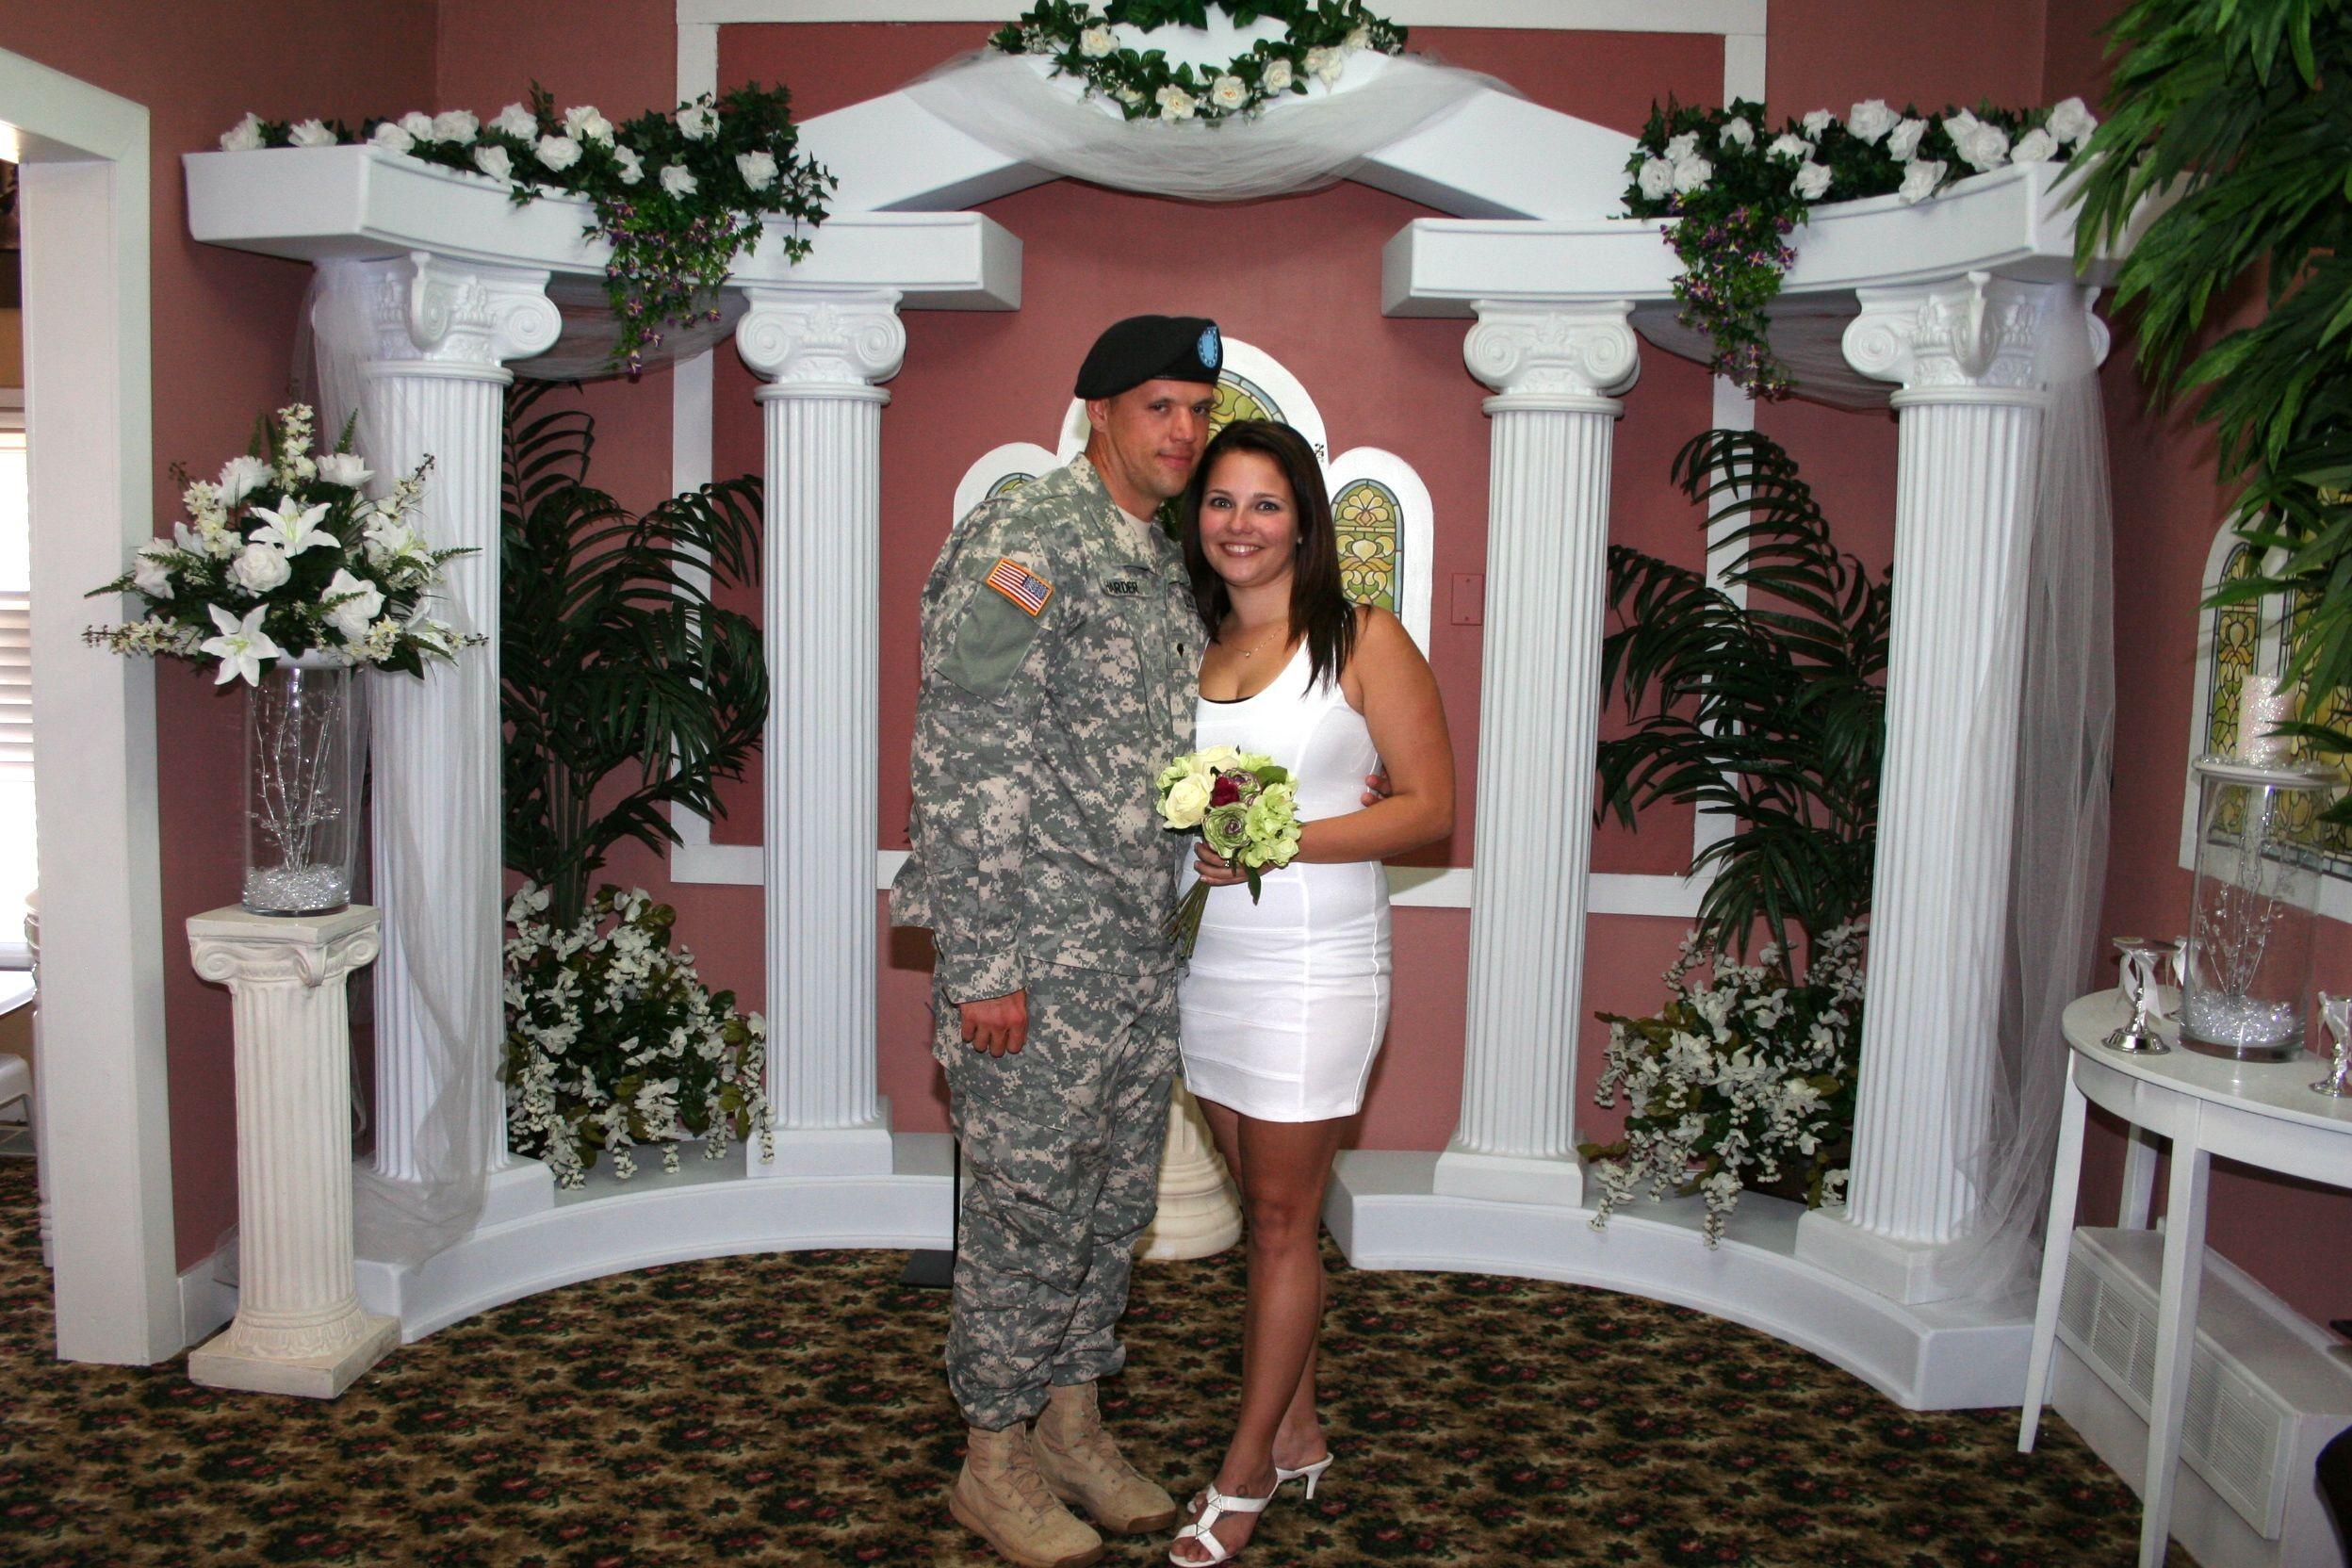 wedding dresses st louis mo photo - 1